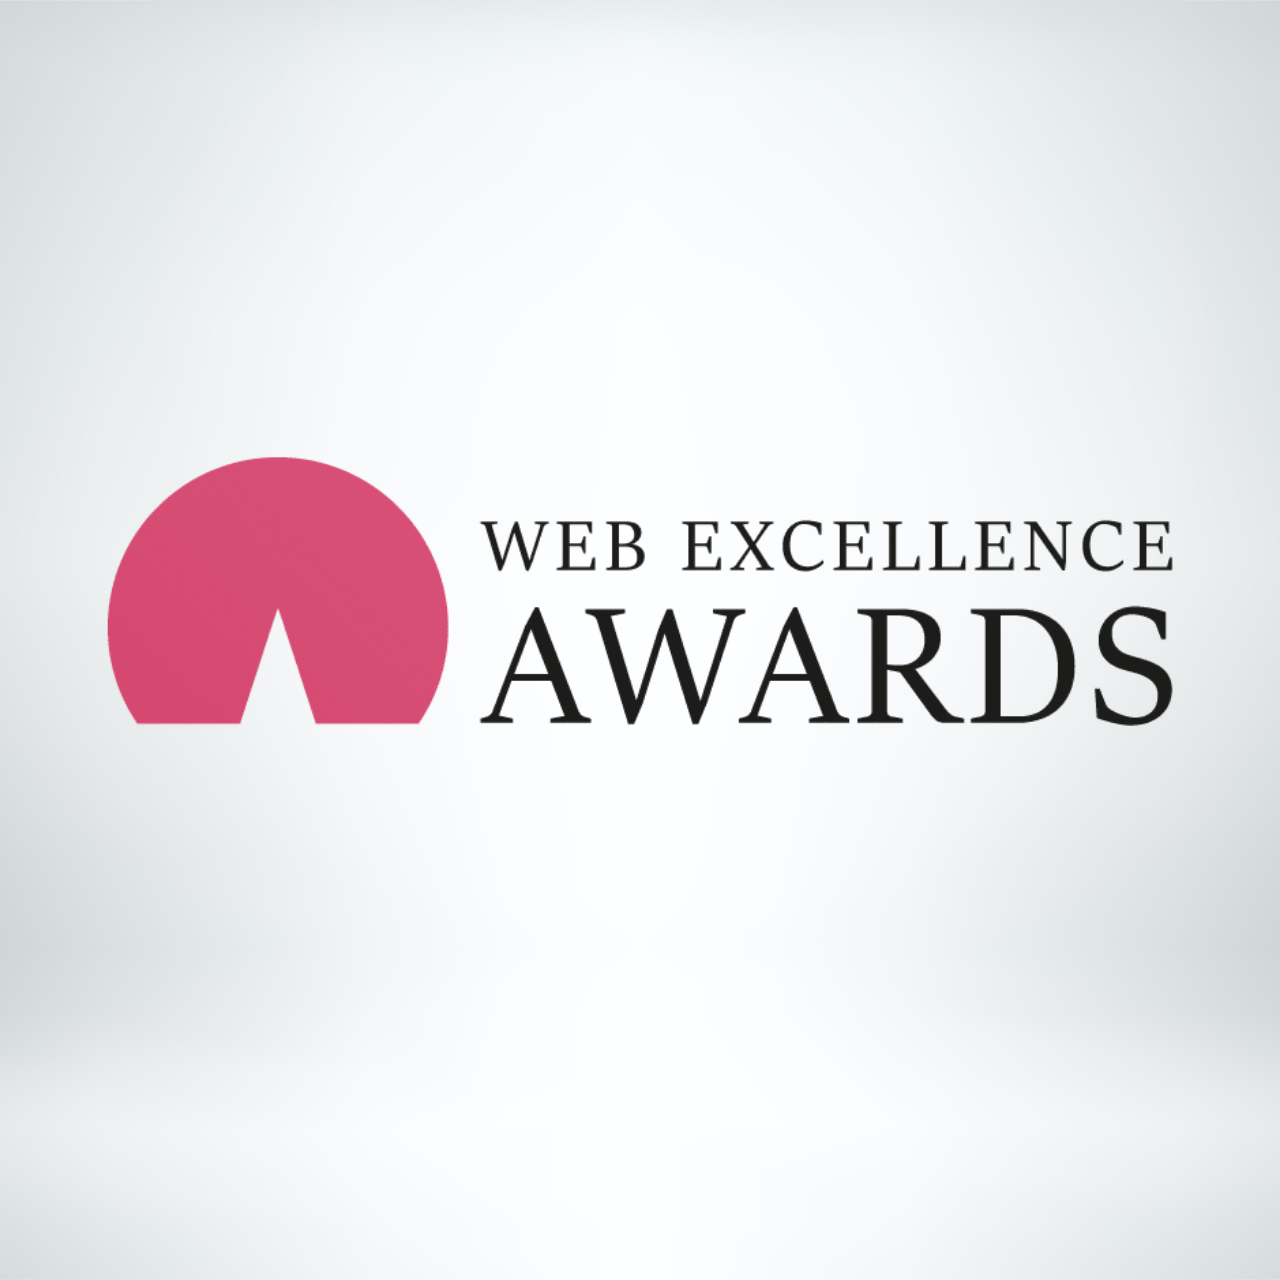 Propr Design Wins Web Excellence Award for Greenspring Advisors